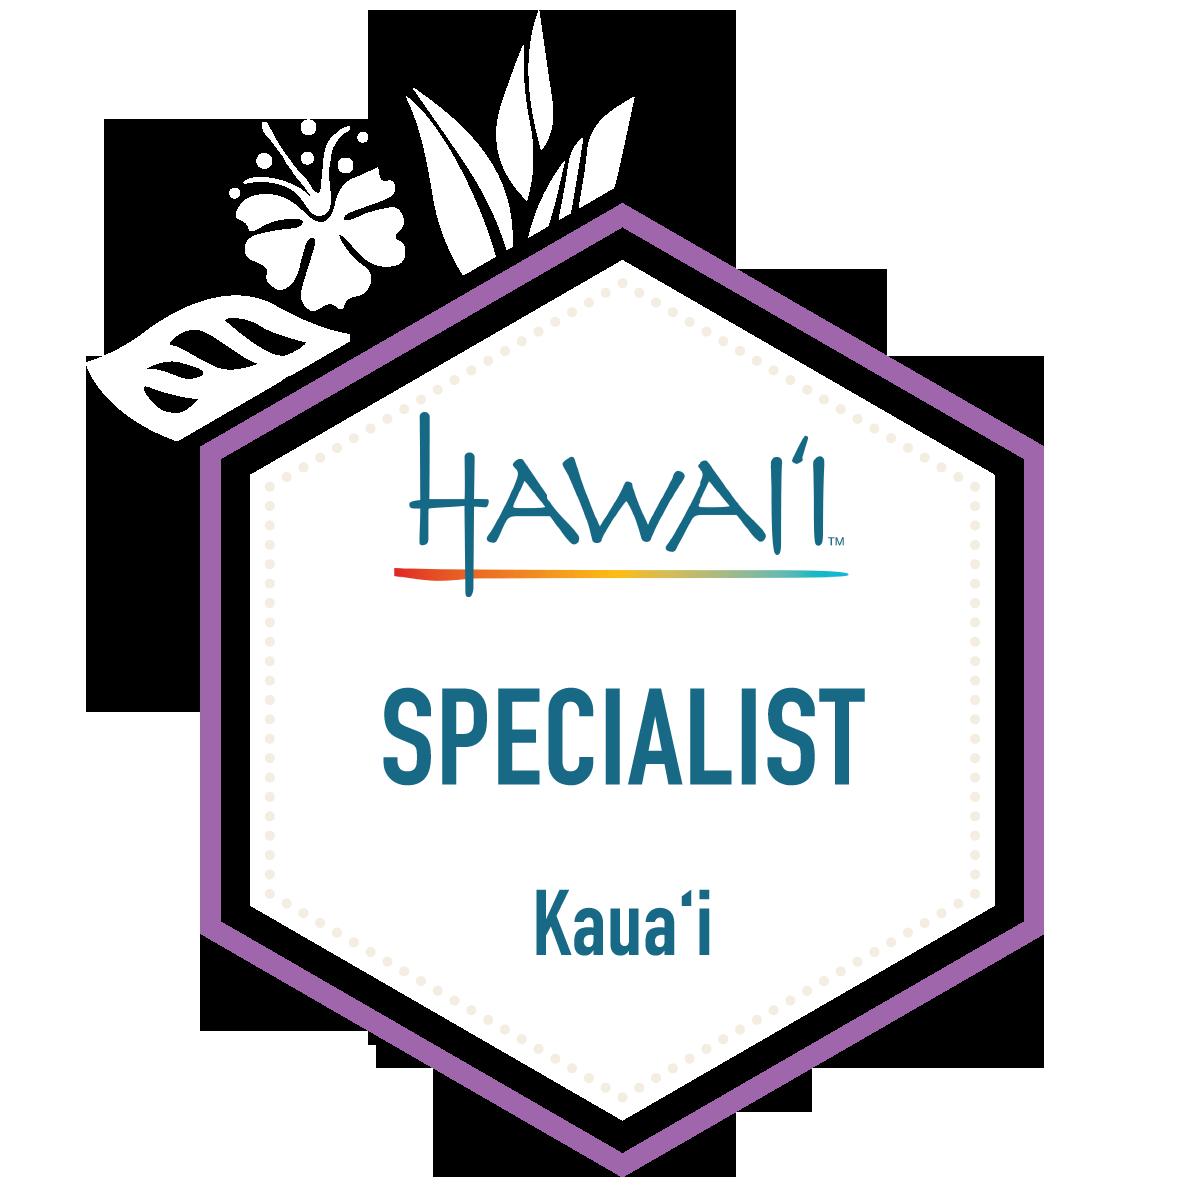 Kauai Specialist